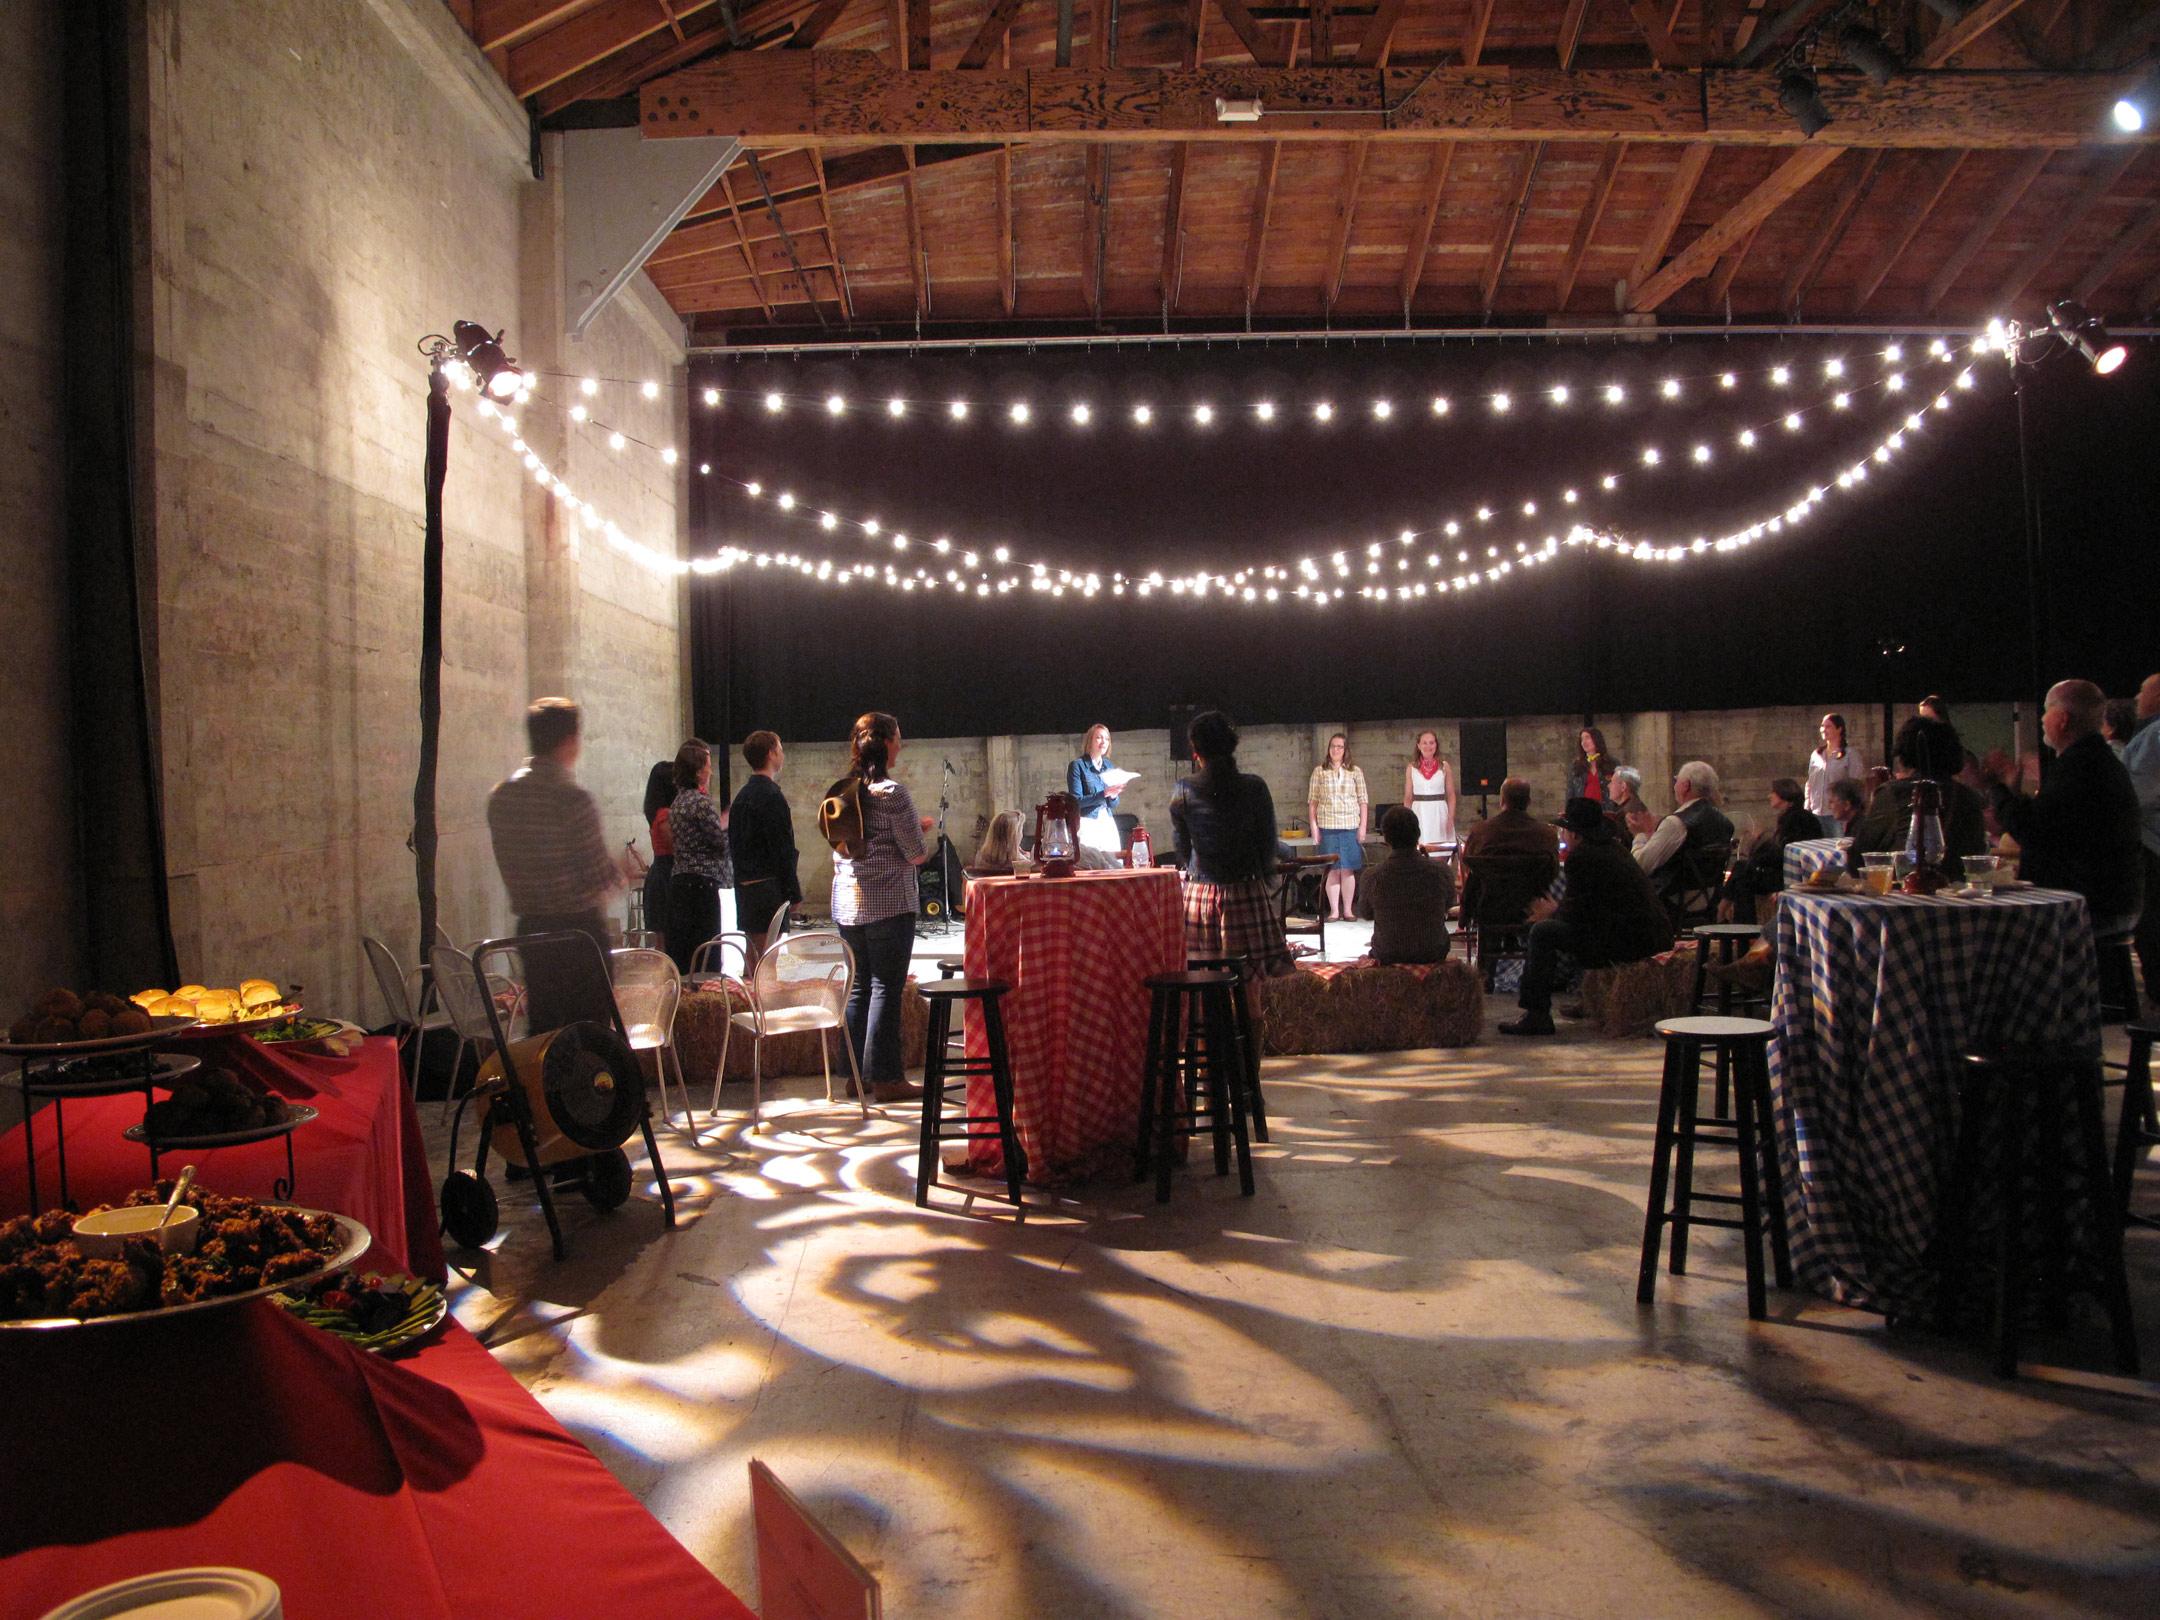 Bay Area Private Event Space